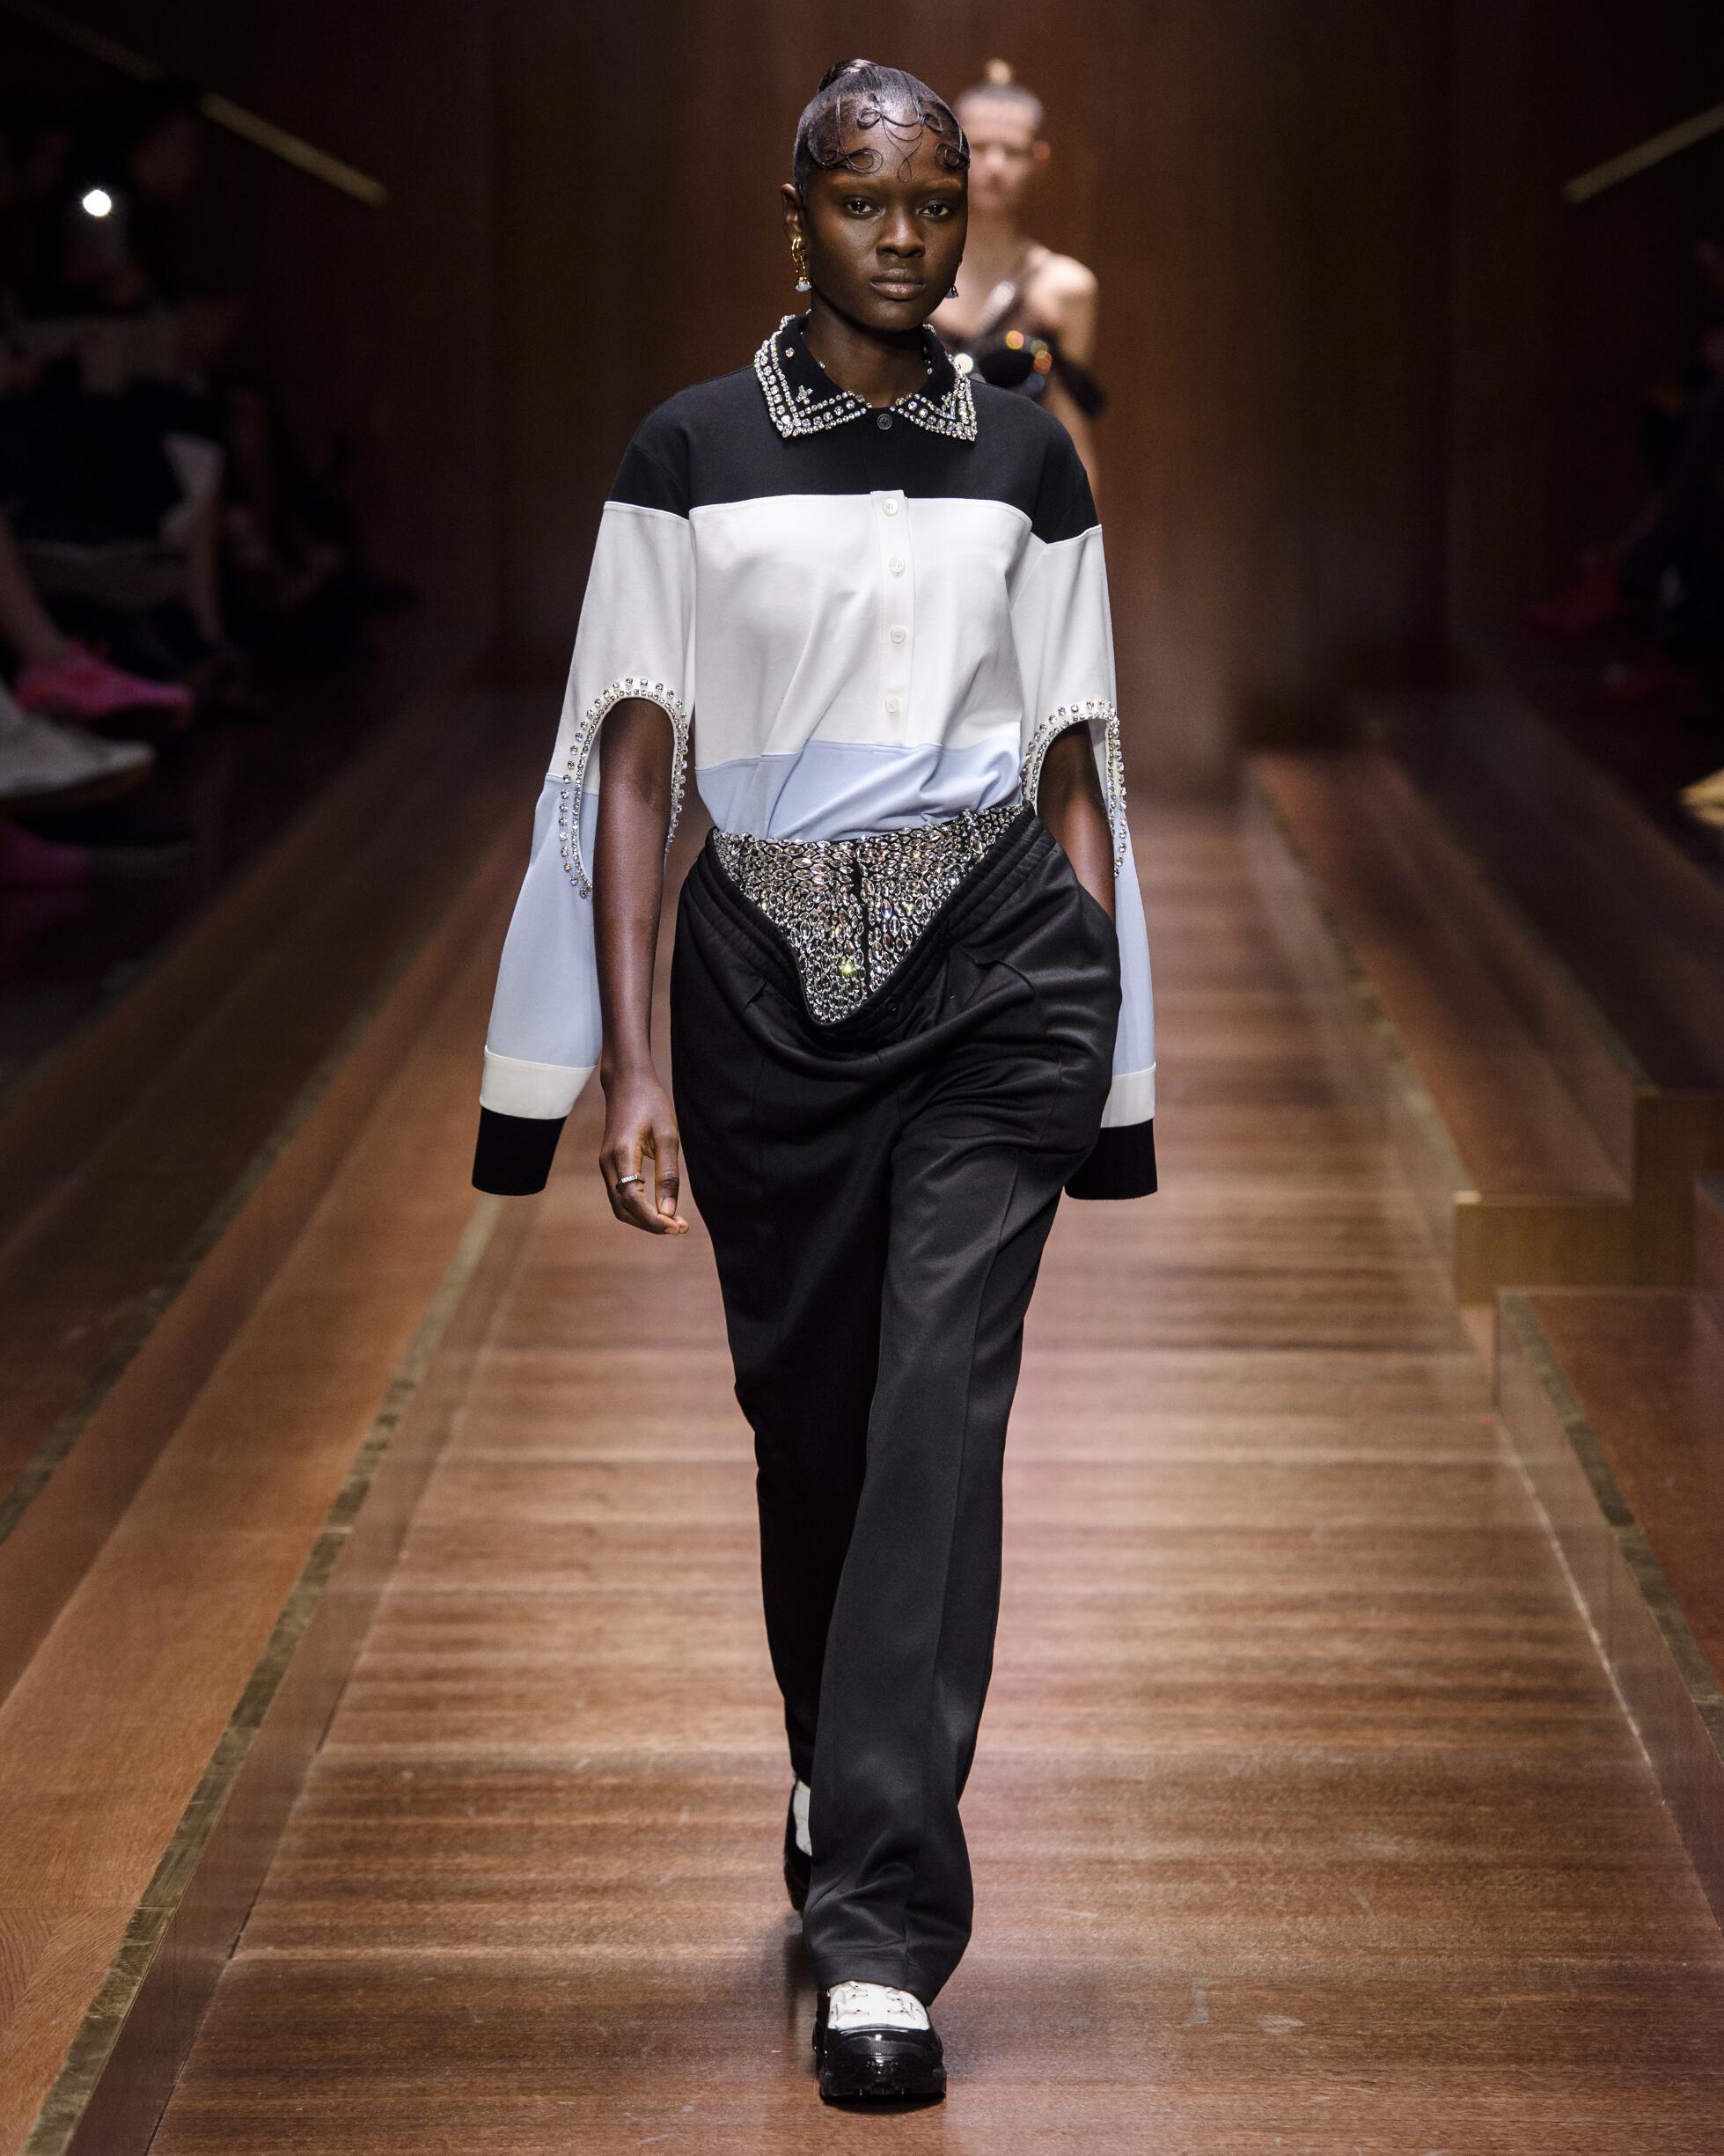 2019 Catwalk Burberry Woman Fashion Show Winter